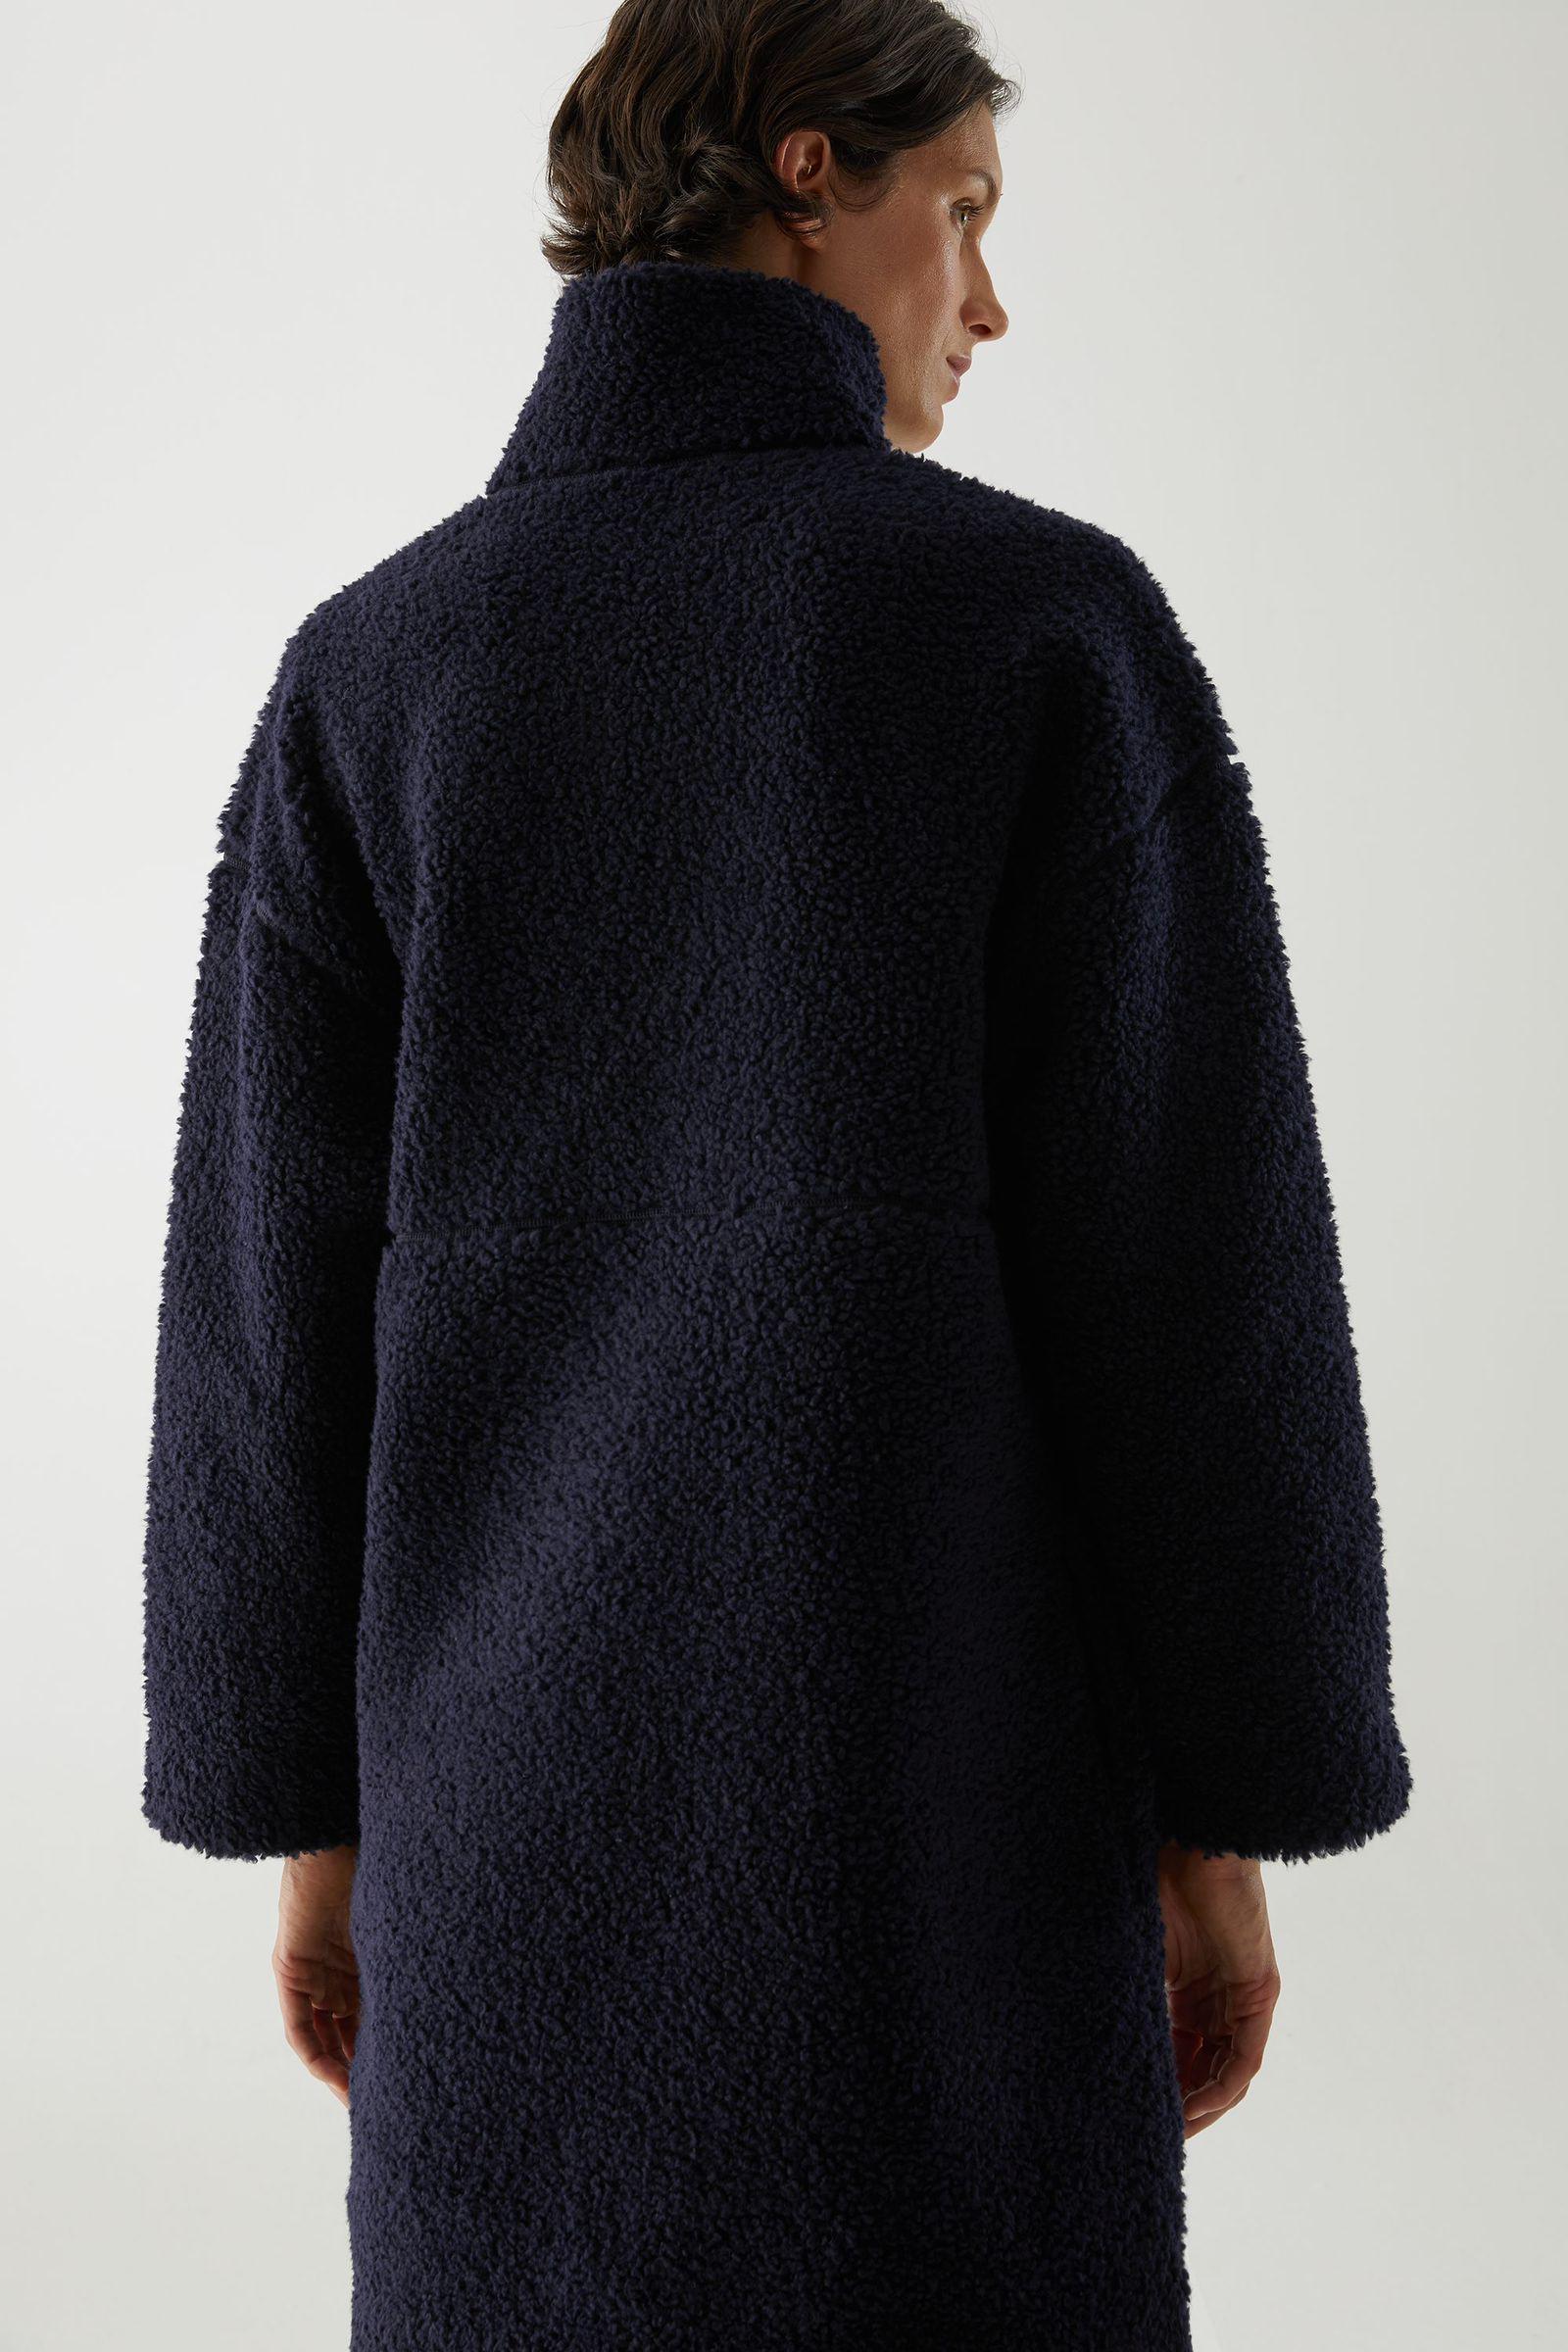 COS 울 믹스 테디 하프 집 클로저 드레스의 네이비컬러 ECOMLook입니다.